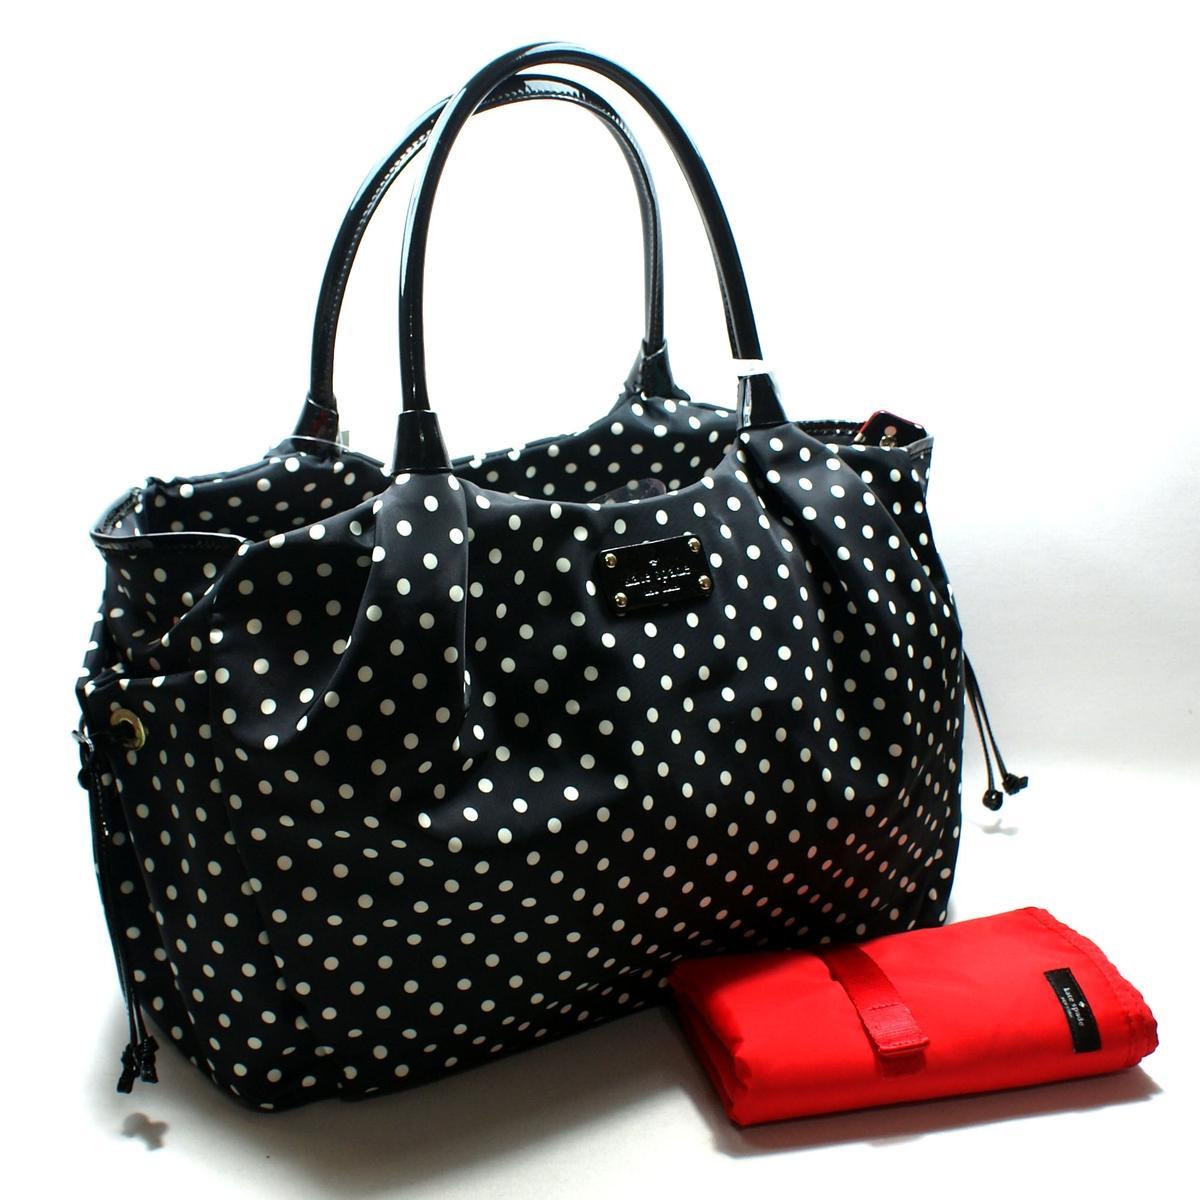 prada baby bag sale prada handbag brown leather. Black Bedroom Furniture Sets. Home Design Ideas